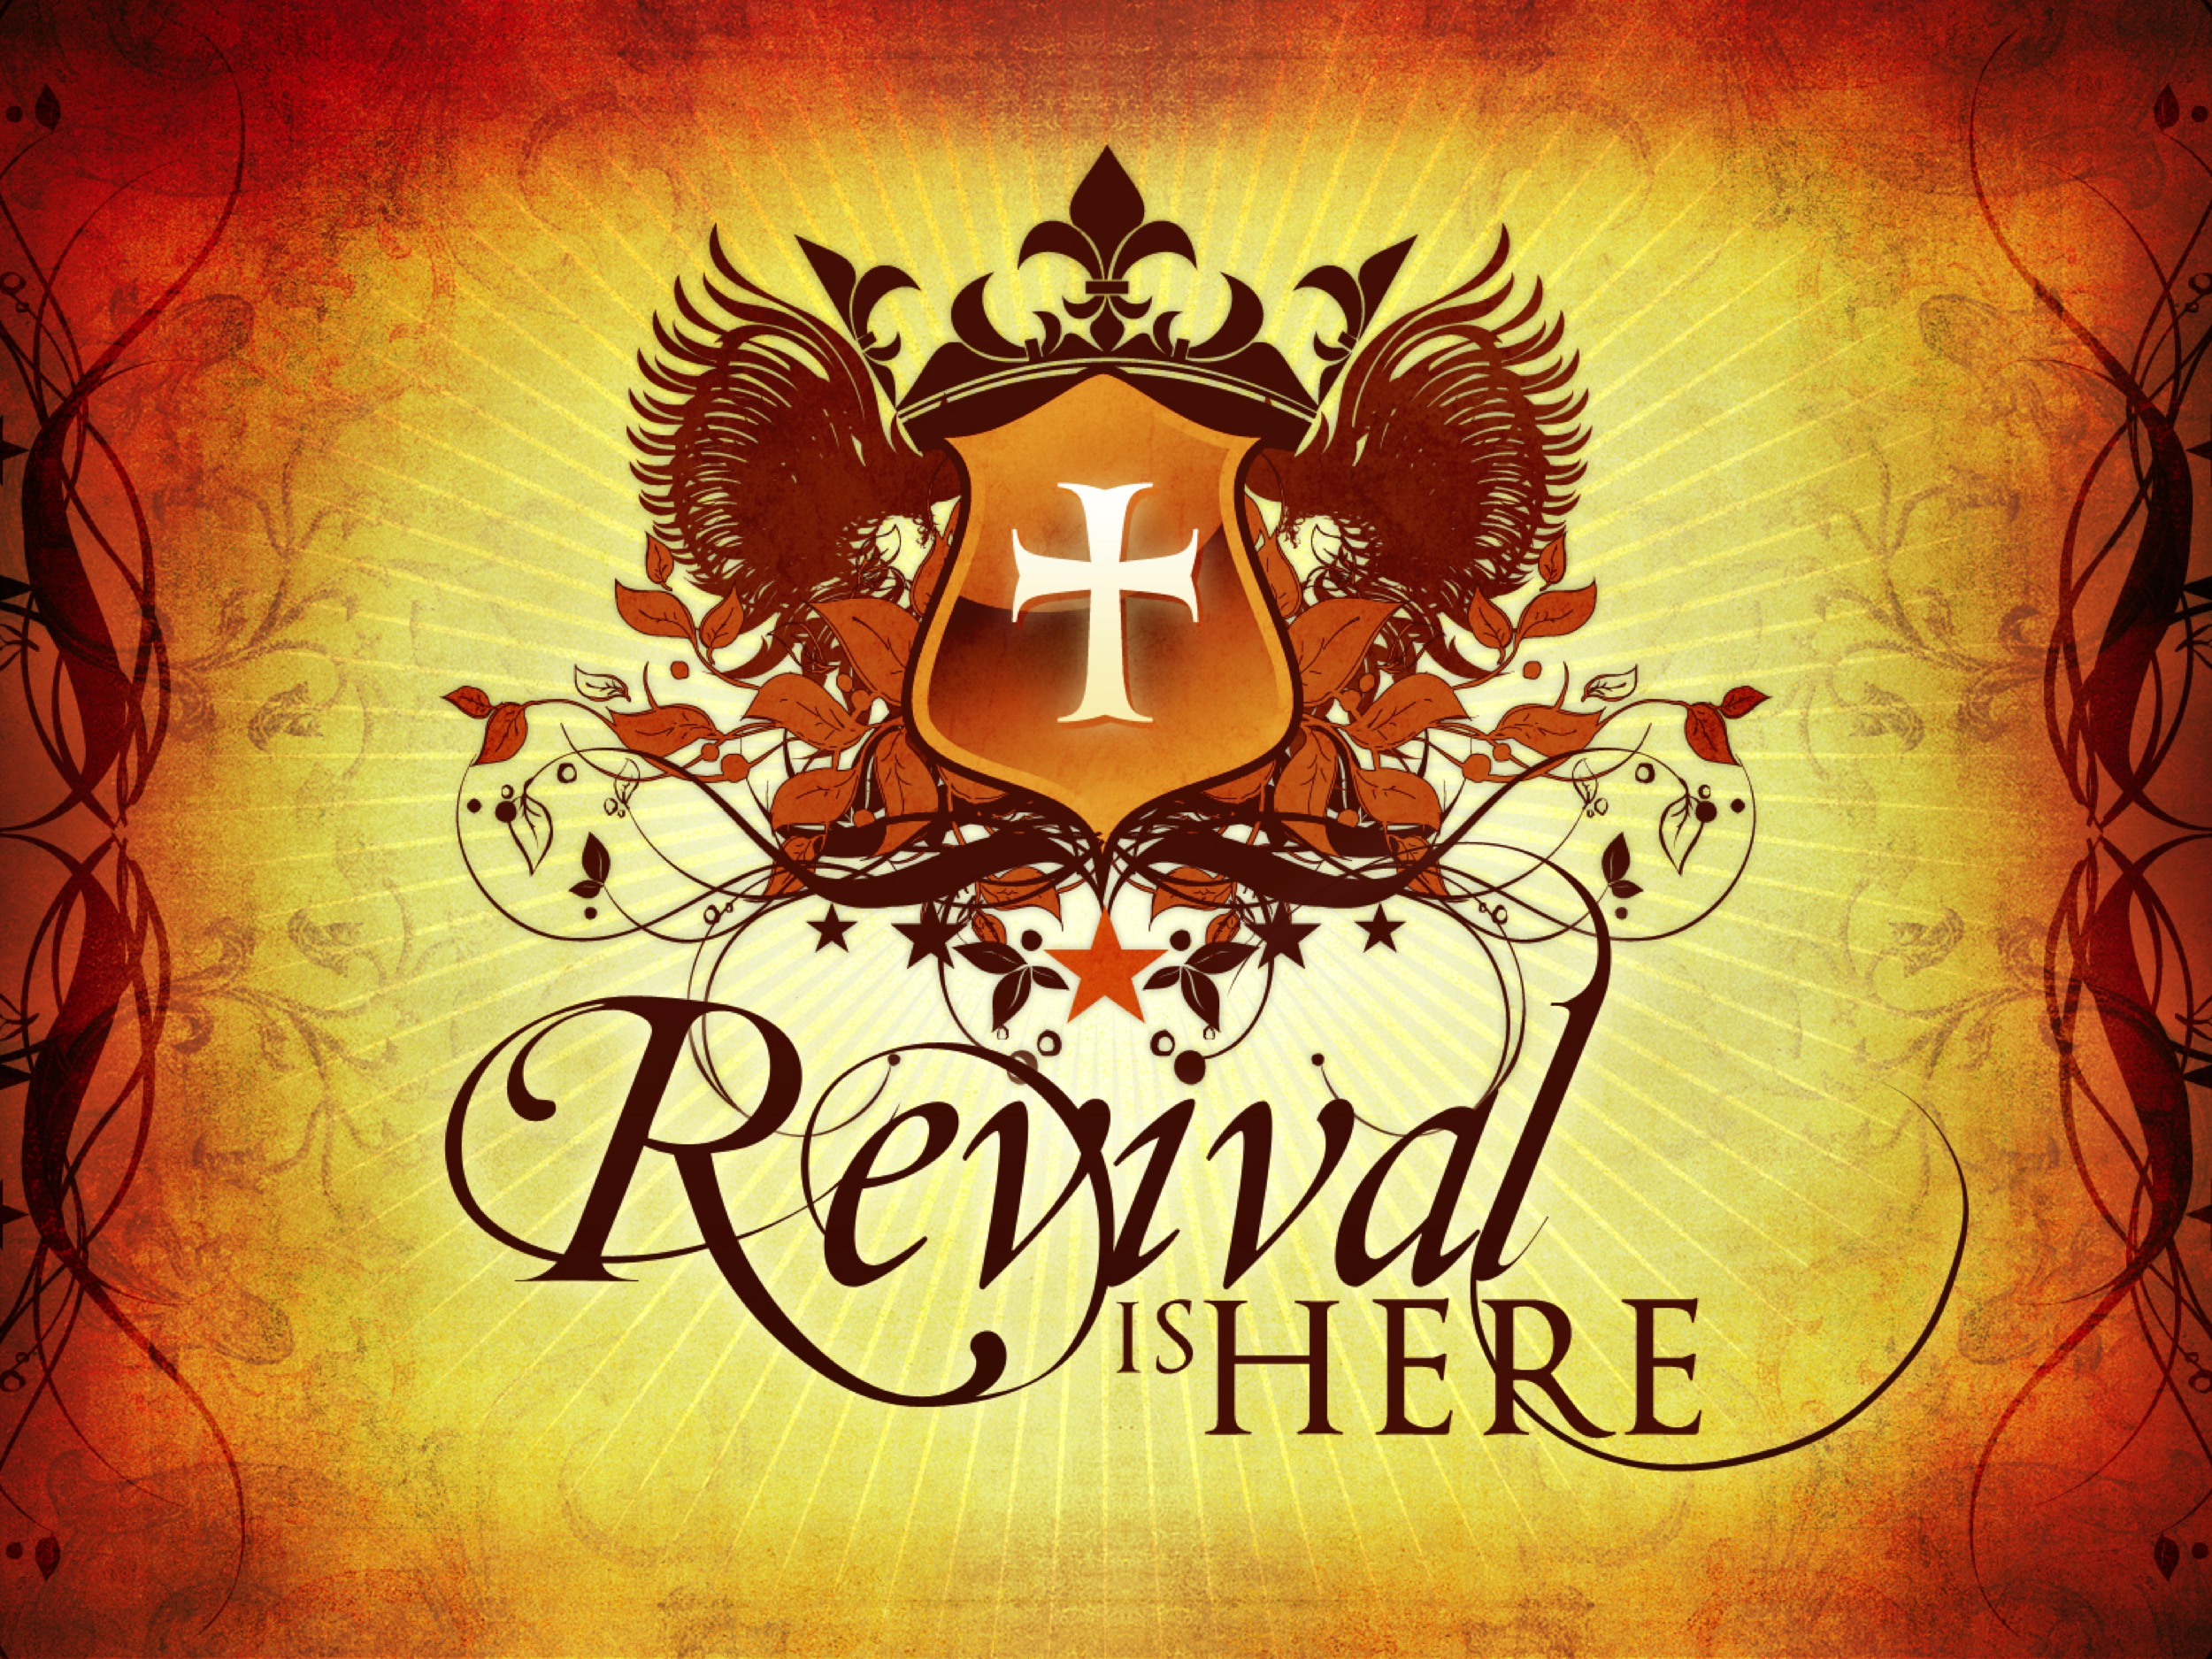 Revival P1